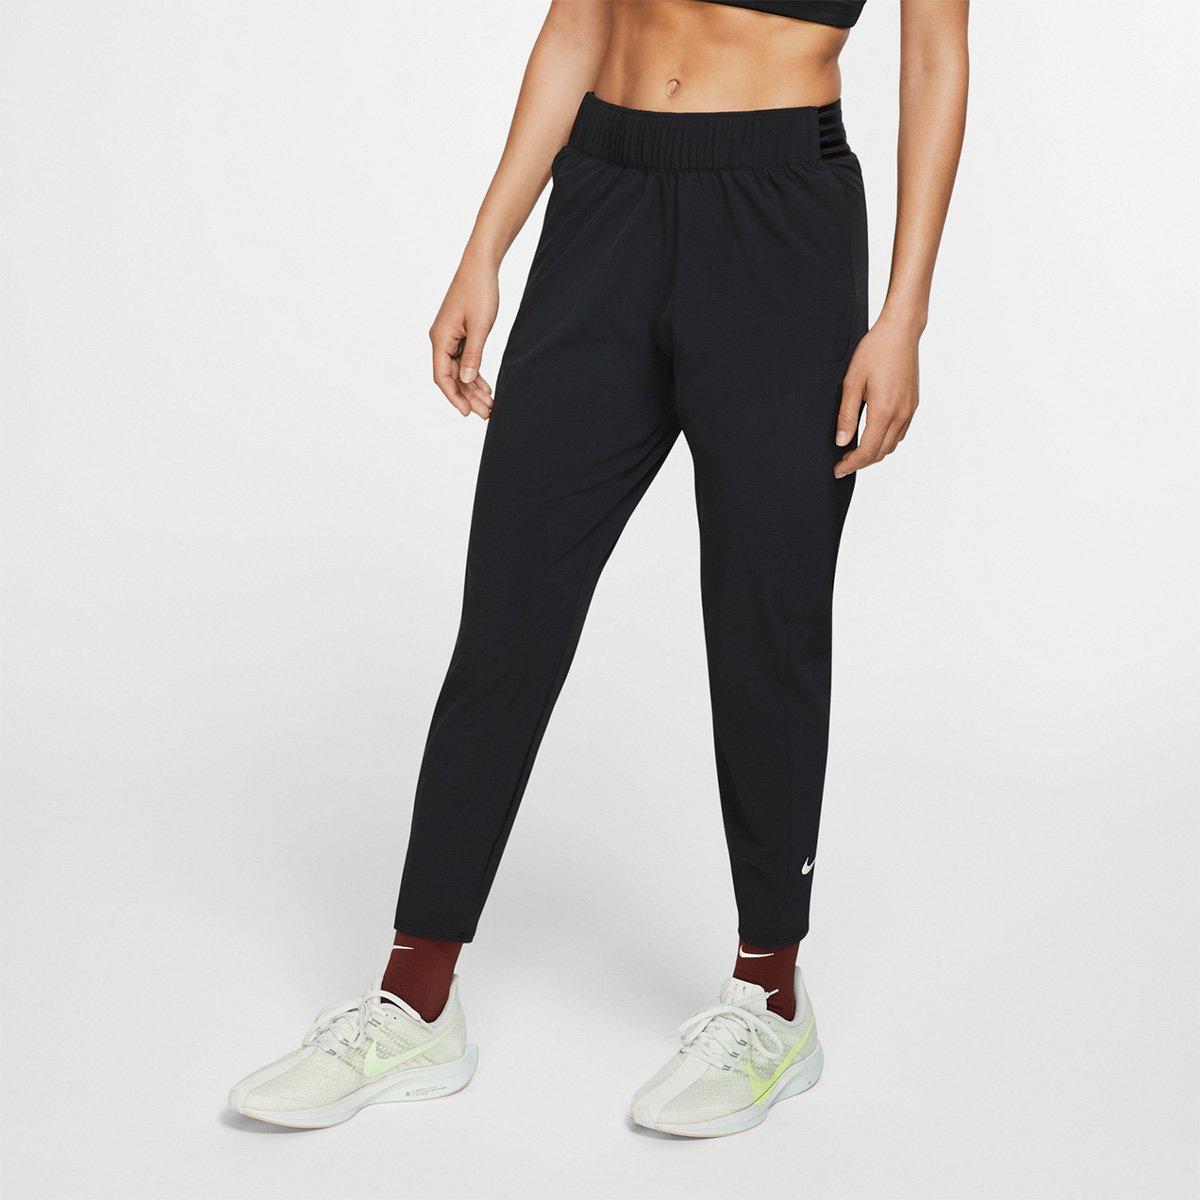 Calça Capri Nike Essential 7/8 Feminina